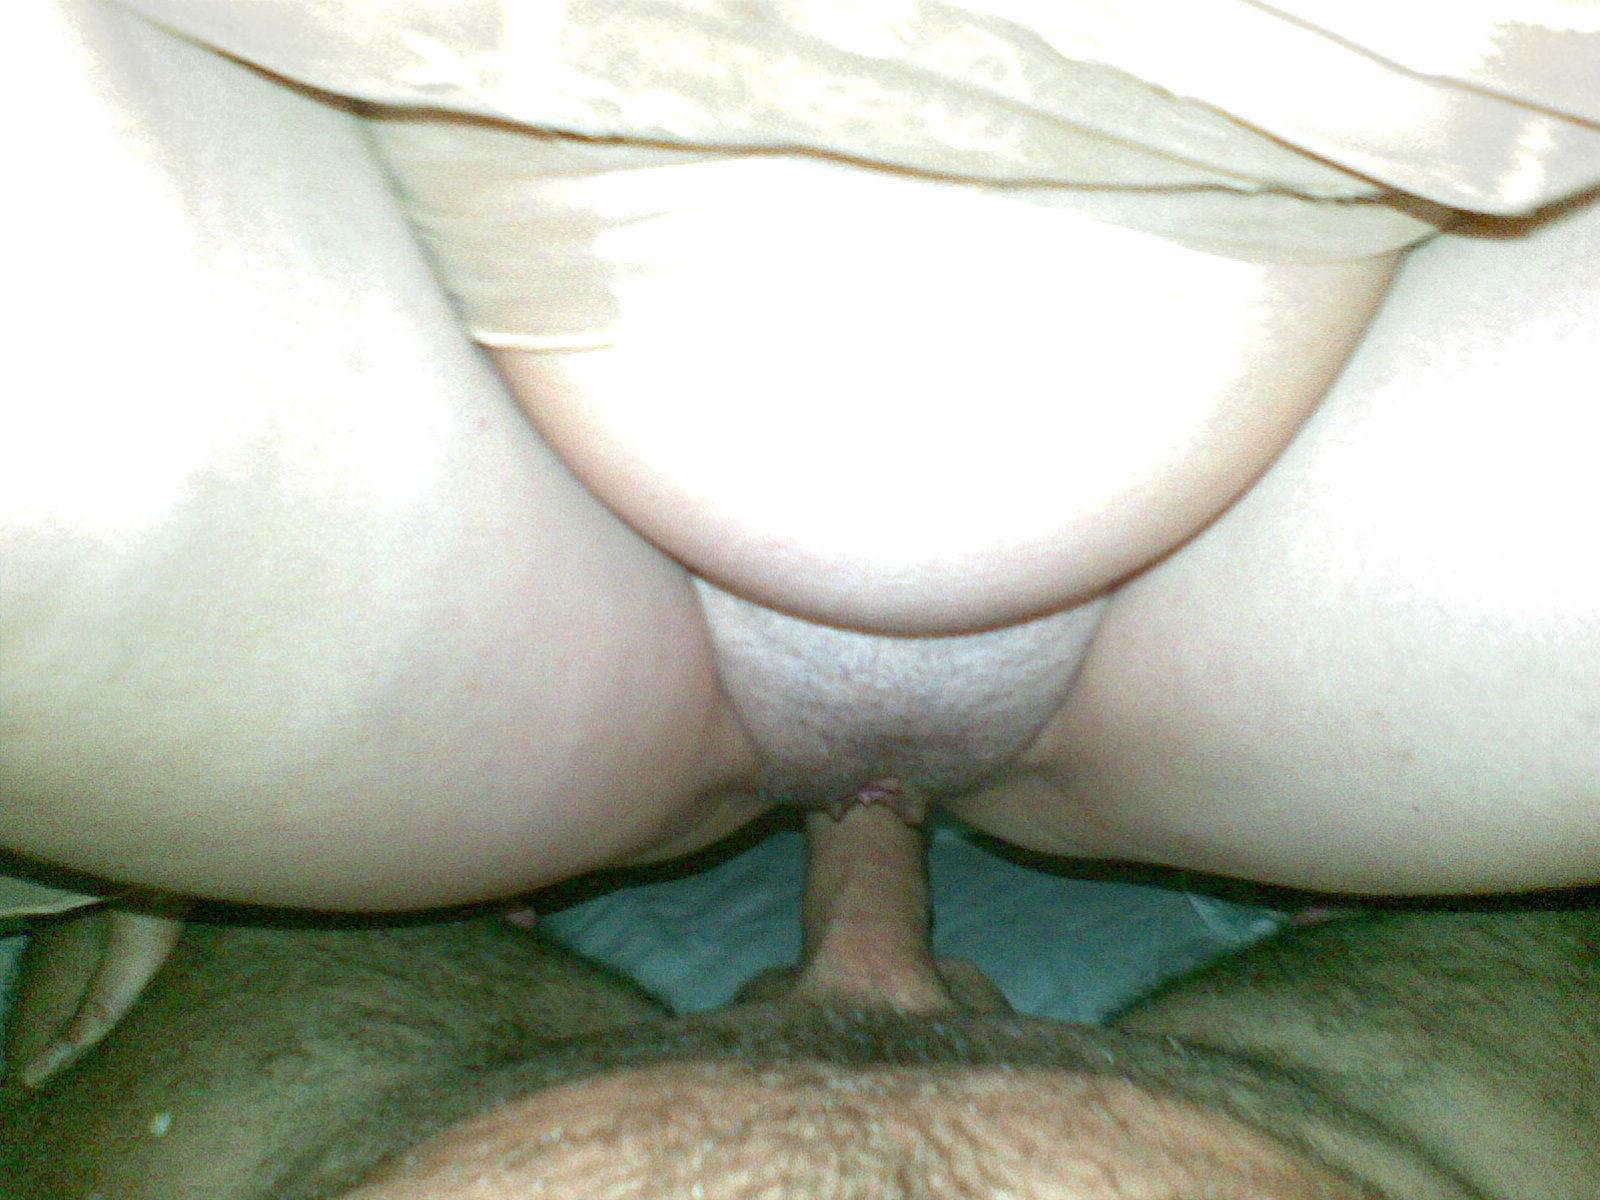 massaggi completi video porn spy cam